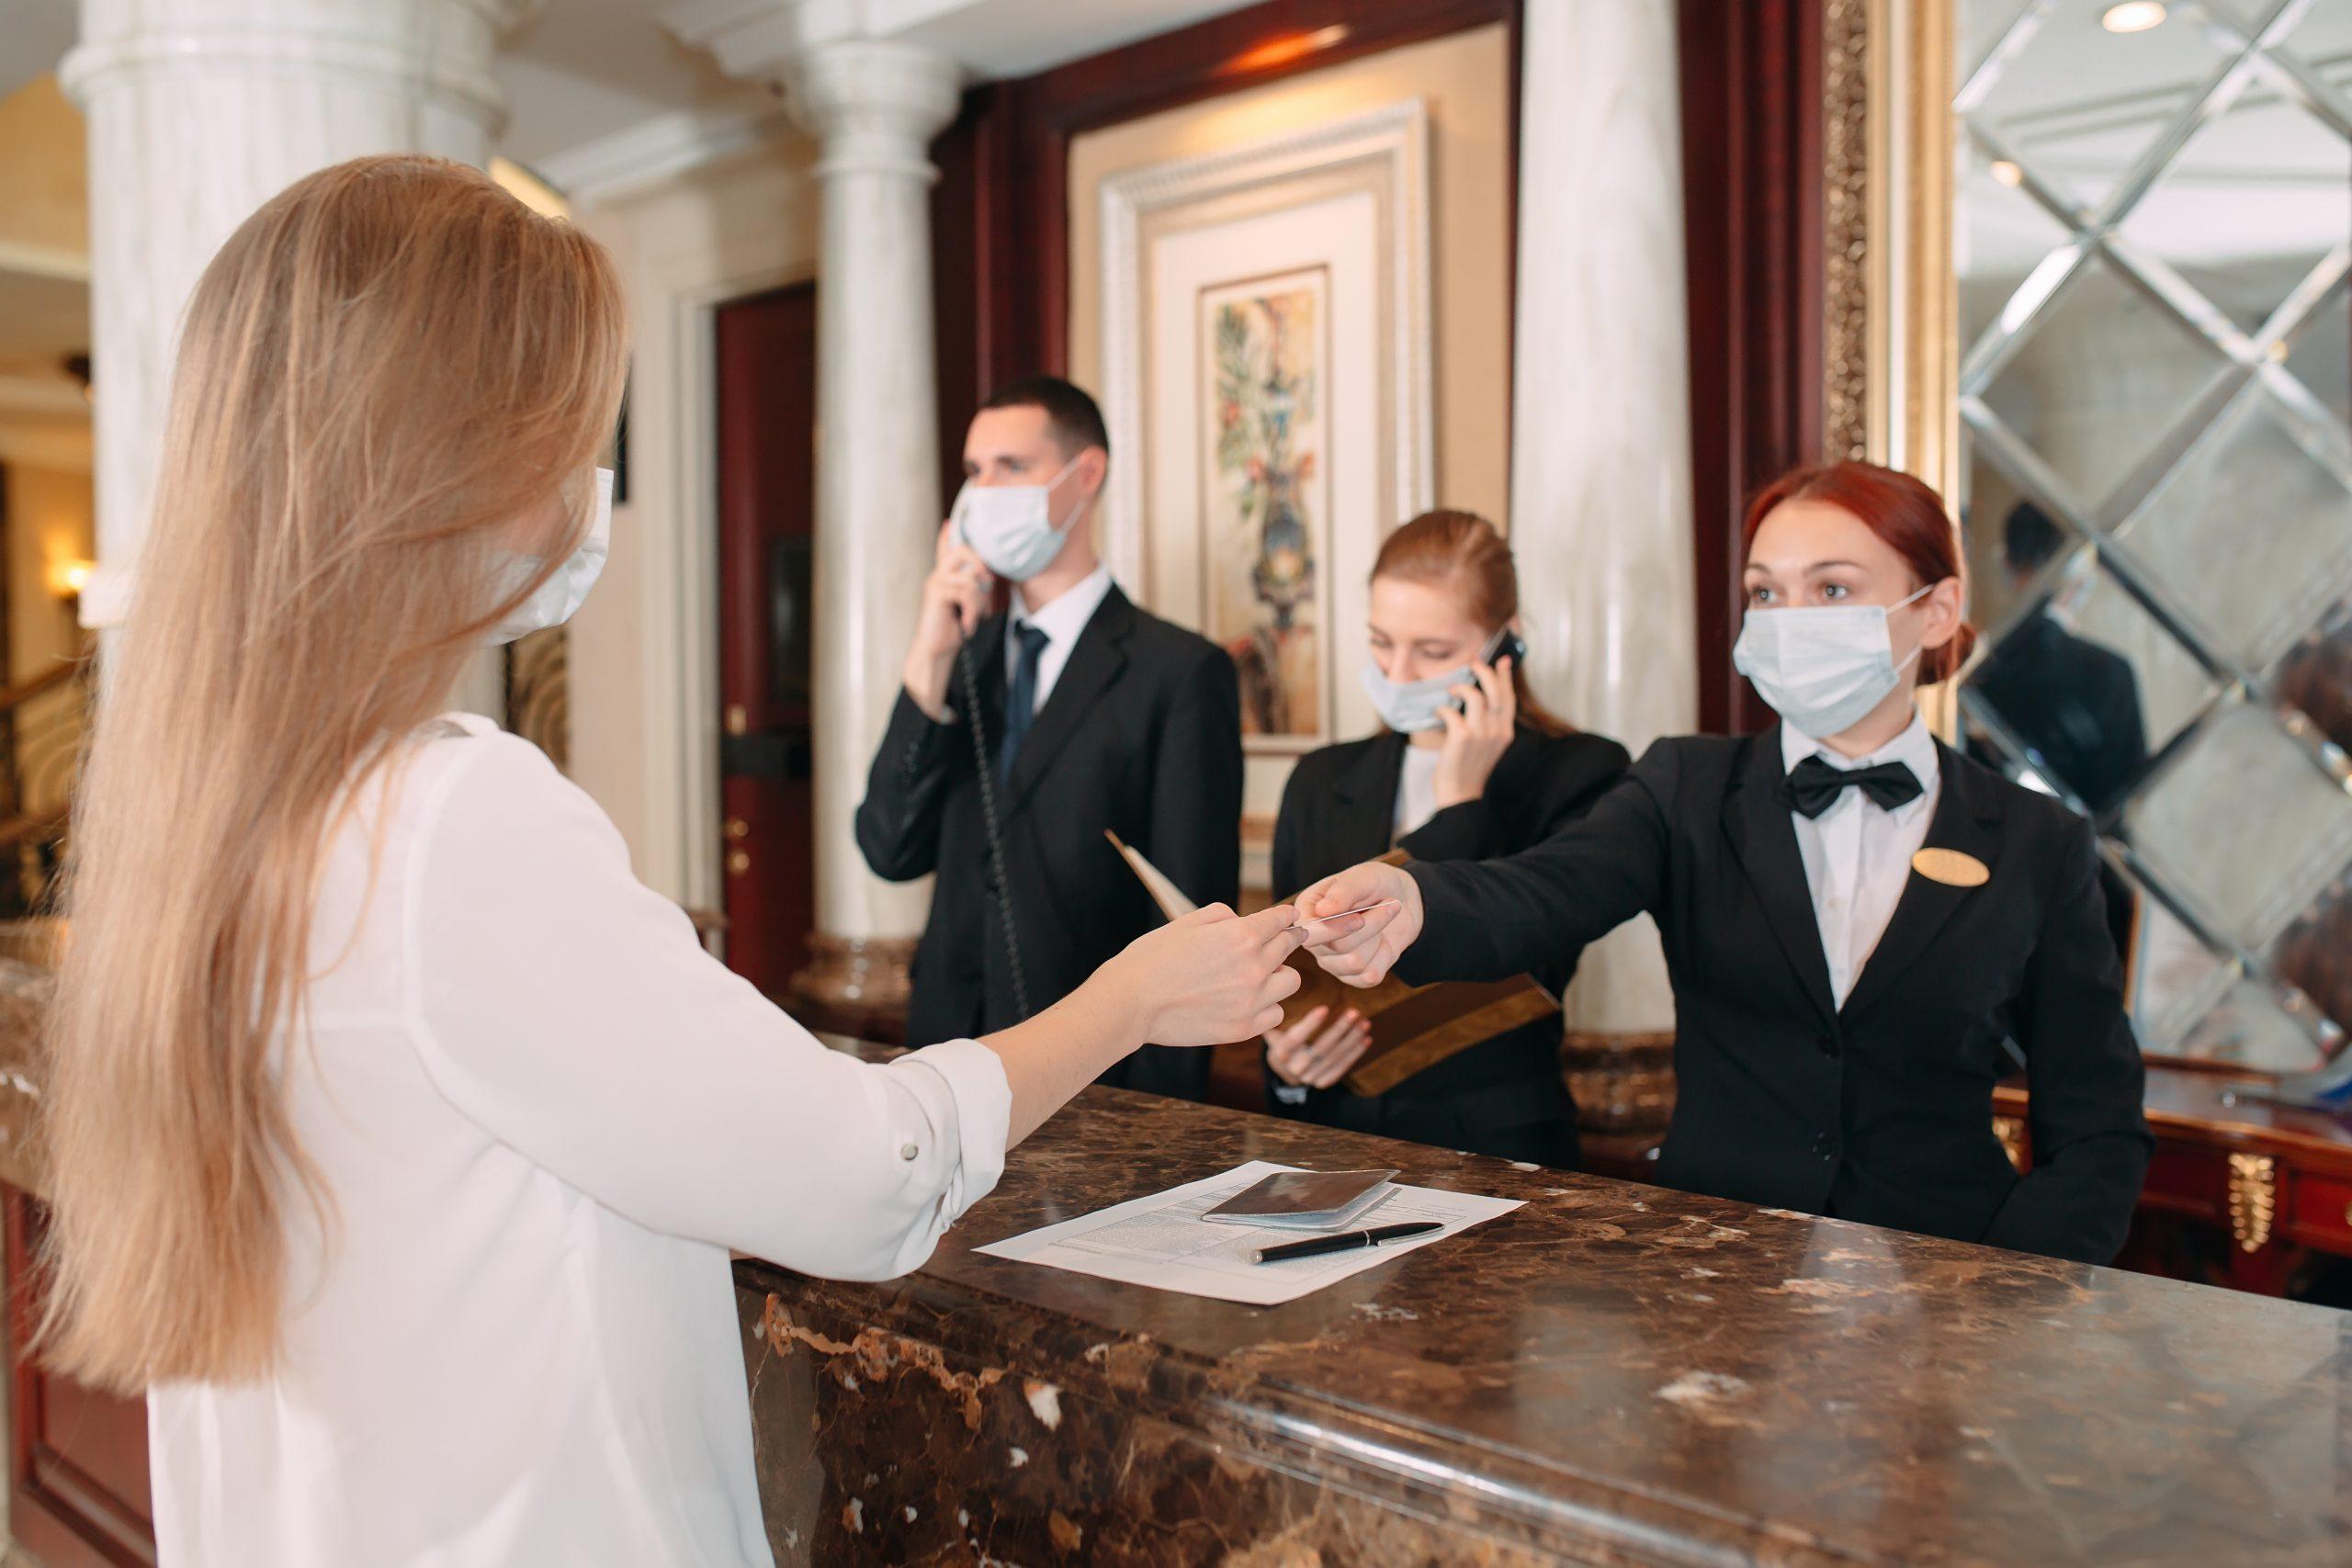 Hospitality & tourism graduate diploma